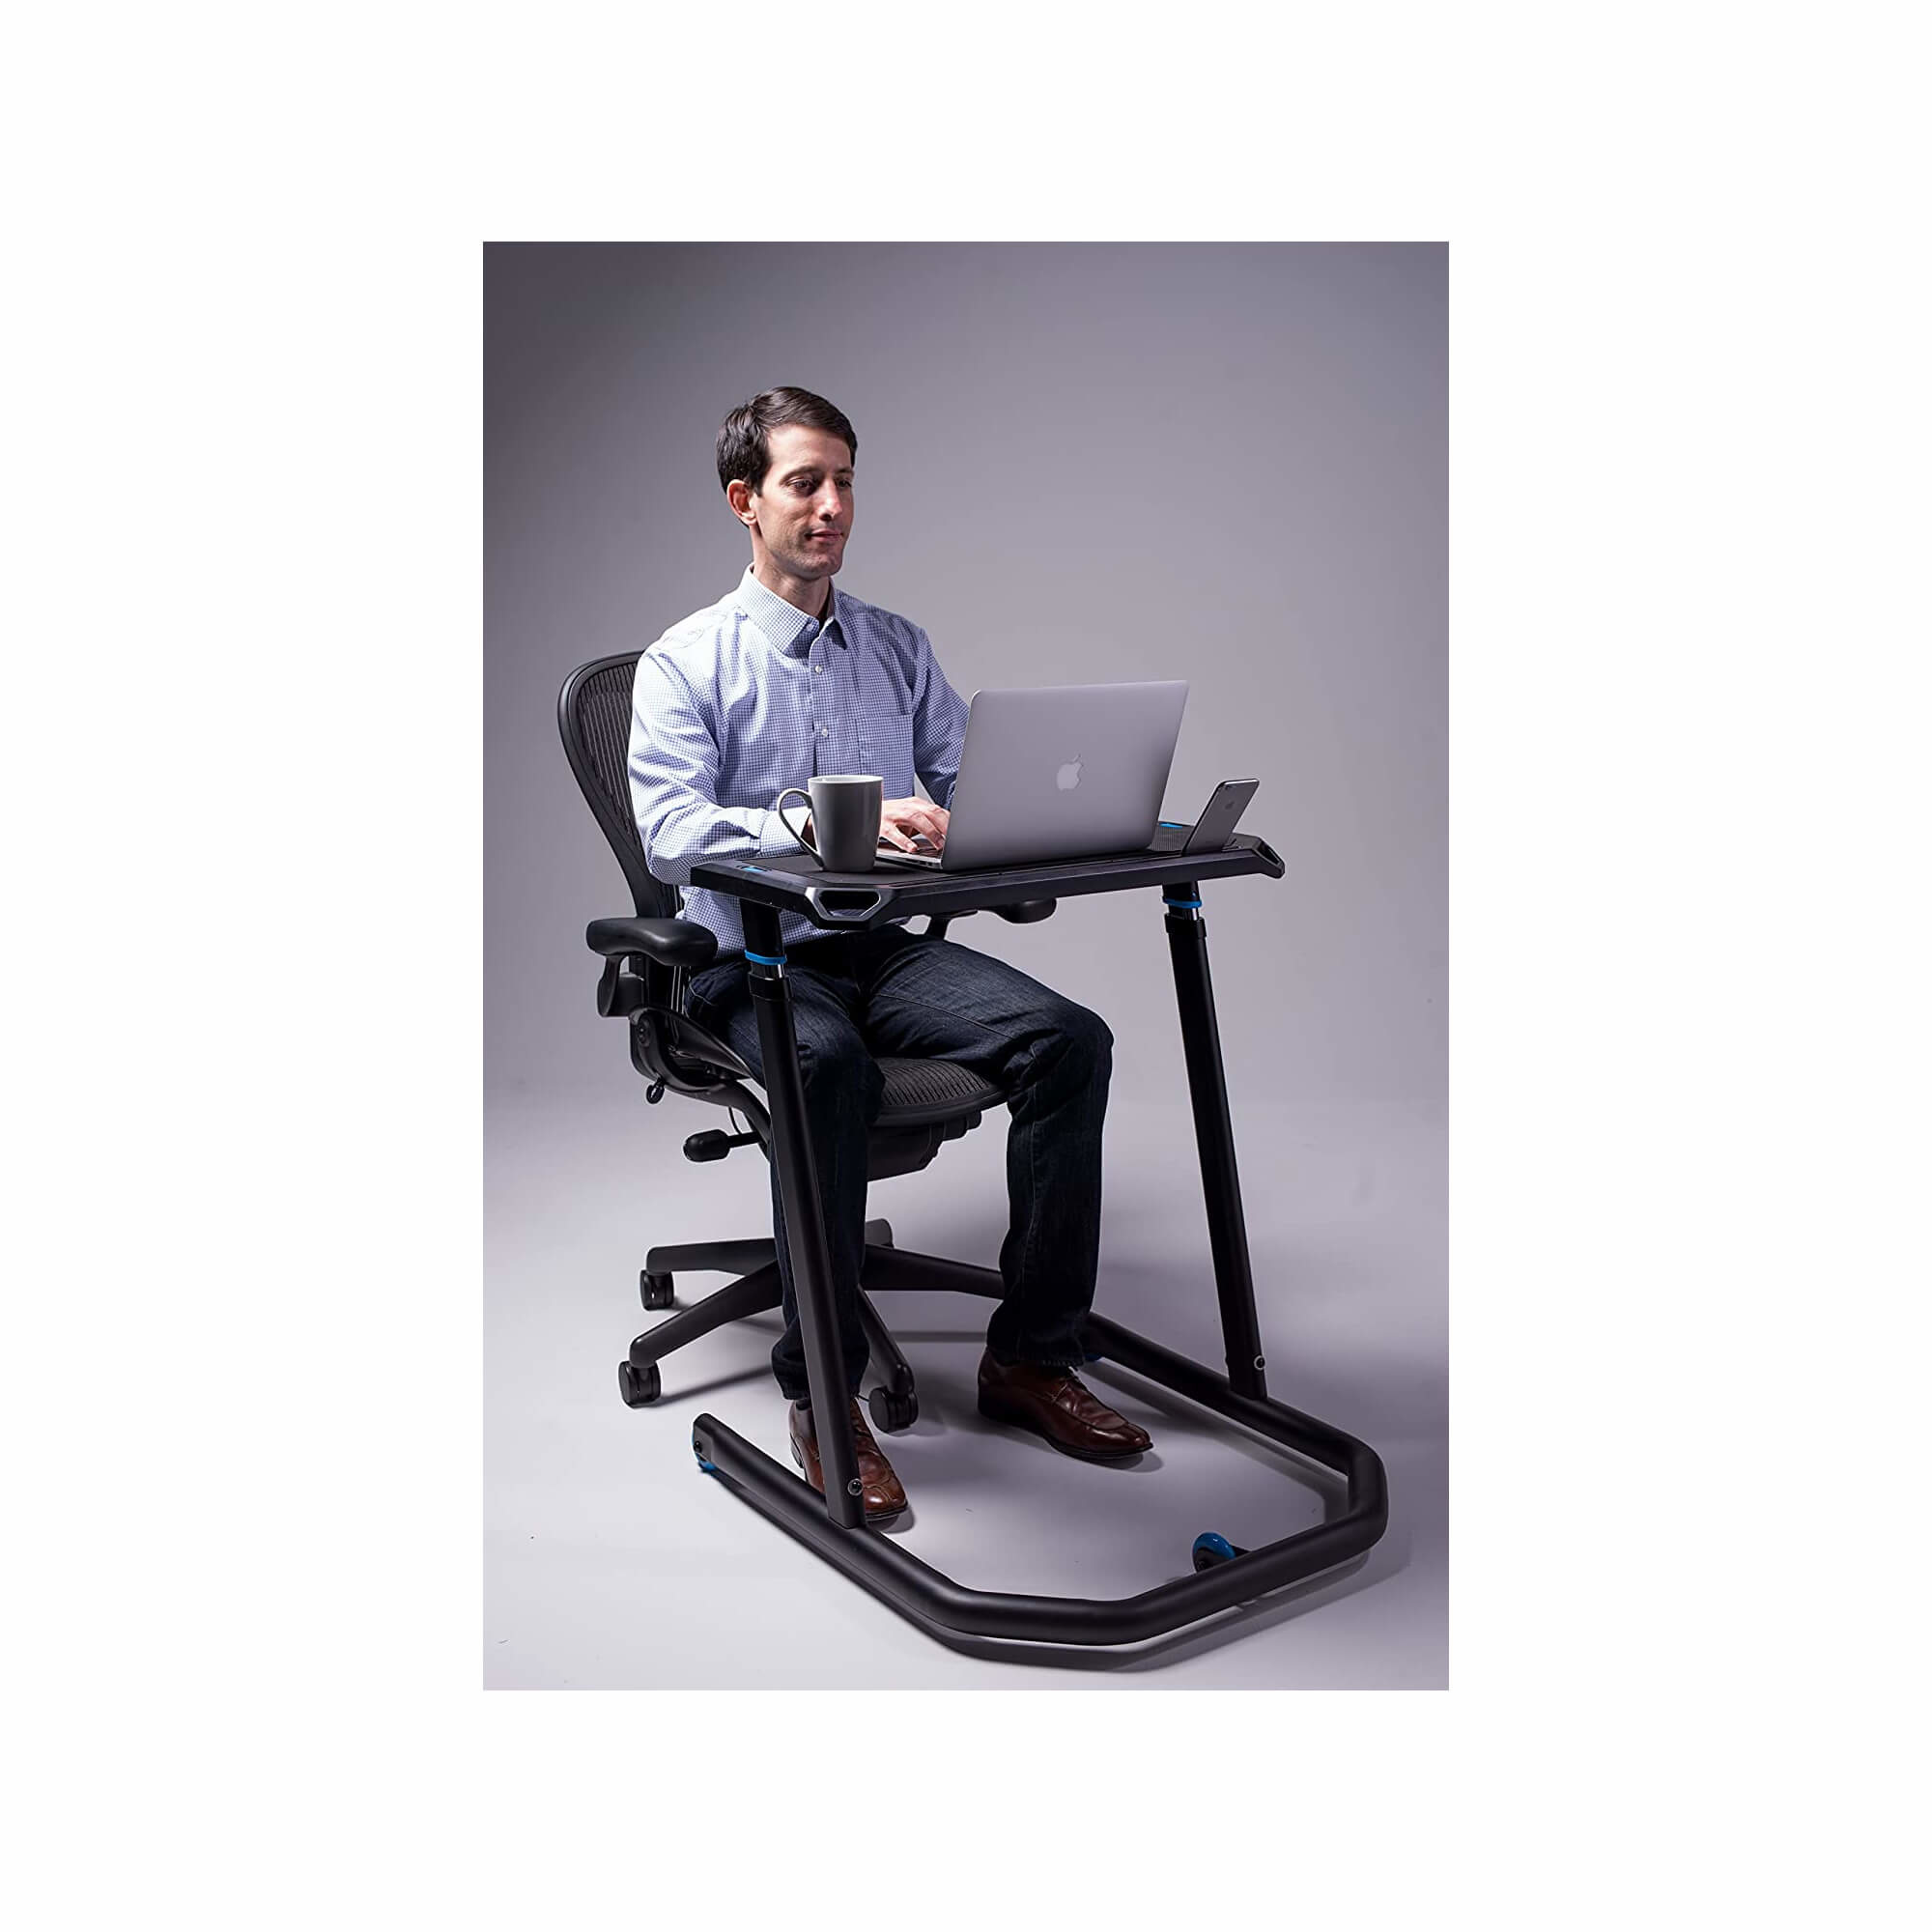 Kickr Fitness Desk-11